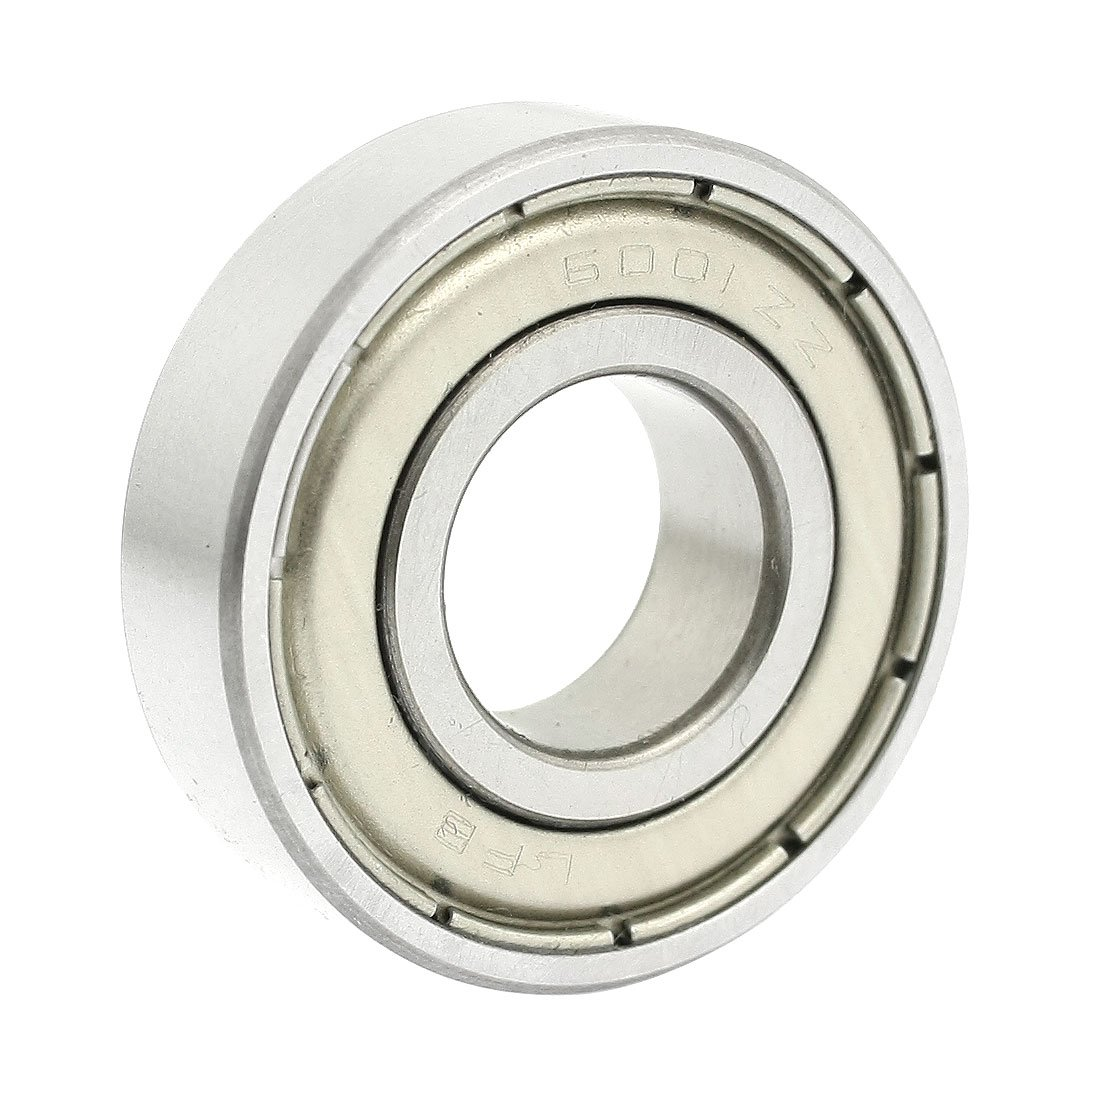 6001ZZ Double Shielded Deep Groove Ball Bearings 28mm x 12mm x 8mm 5 pcs double sealed 3 x 7 x 3mm deep groove ball bearings page 4